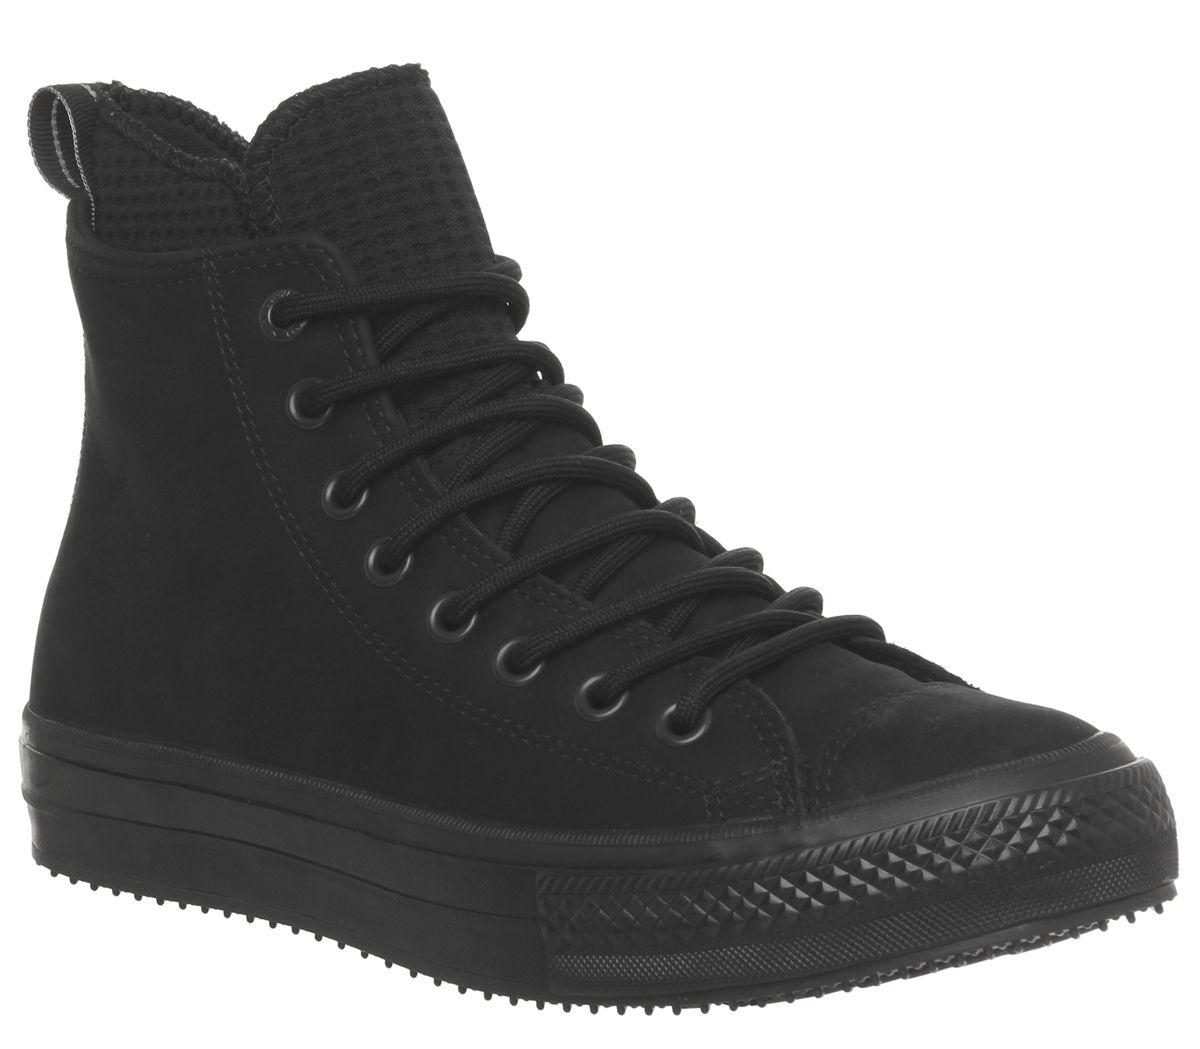 47e85a050658df Converse All Star Hi Wp Boots Black Mono - His trainers